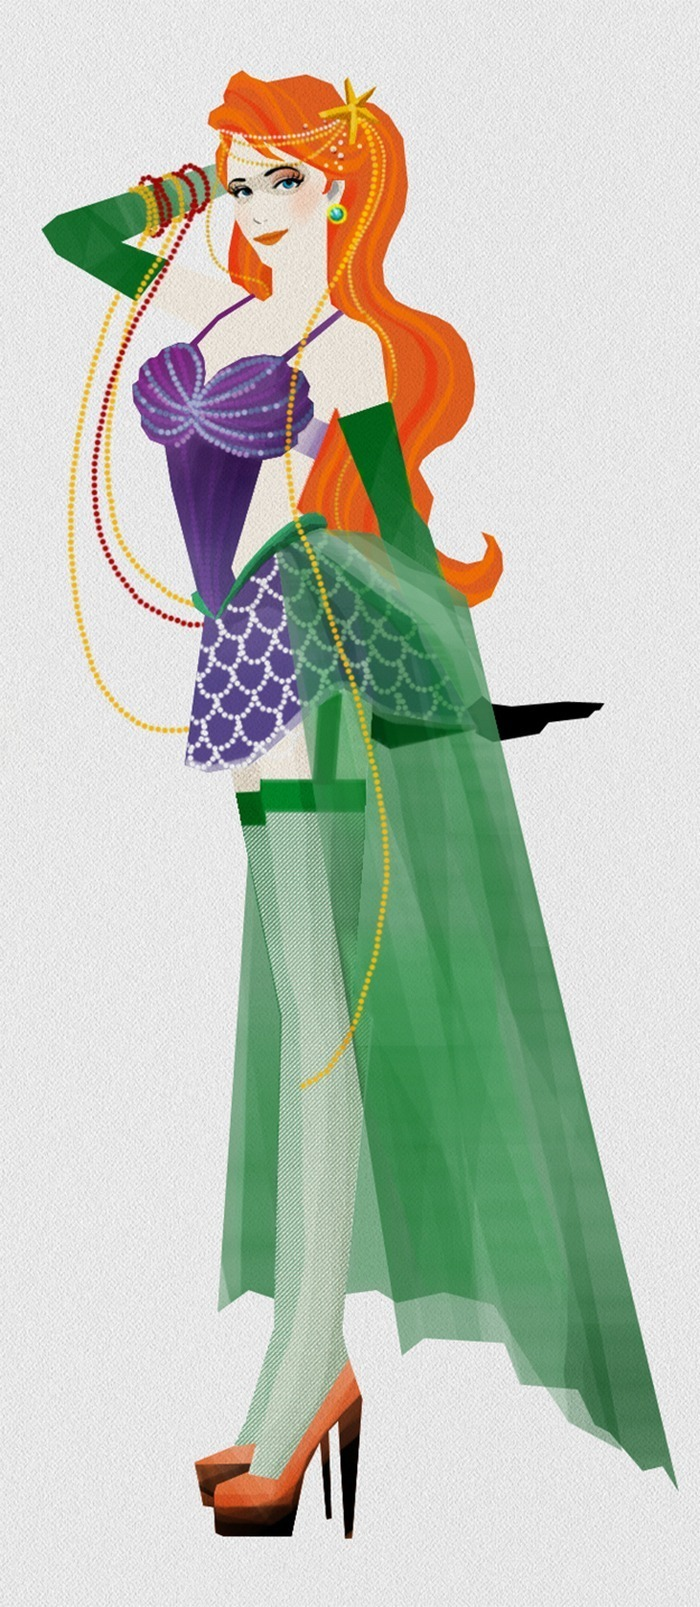 princesas-disney-burlescas-6